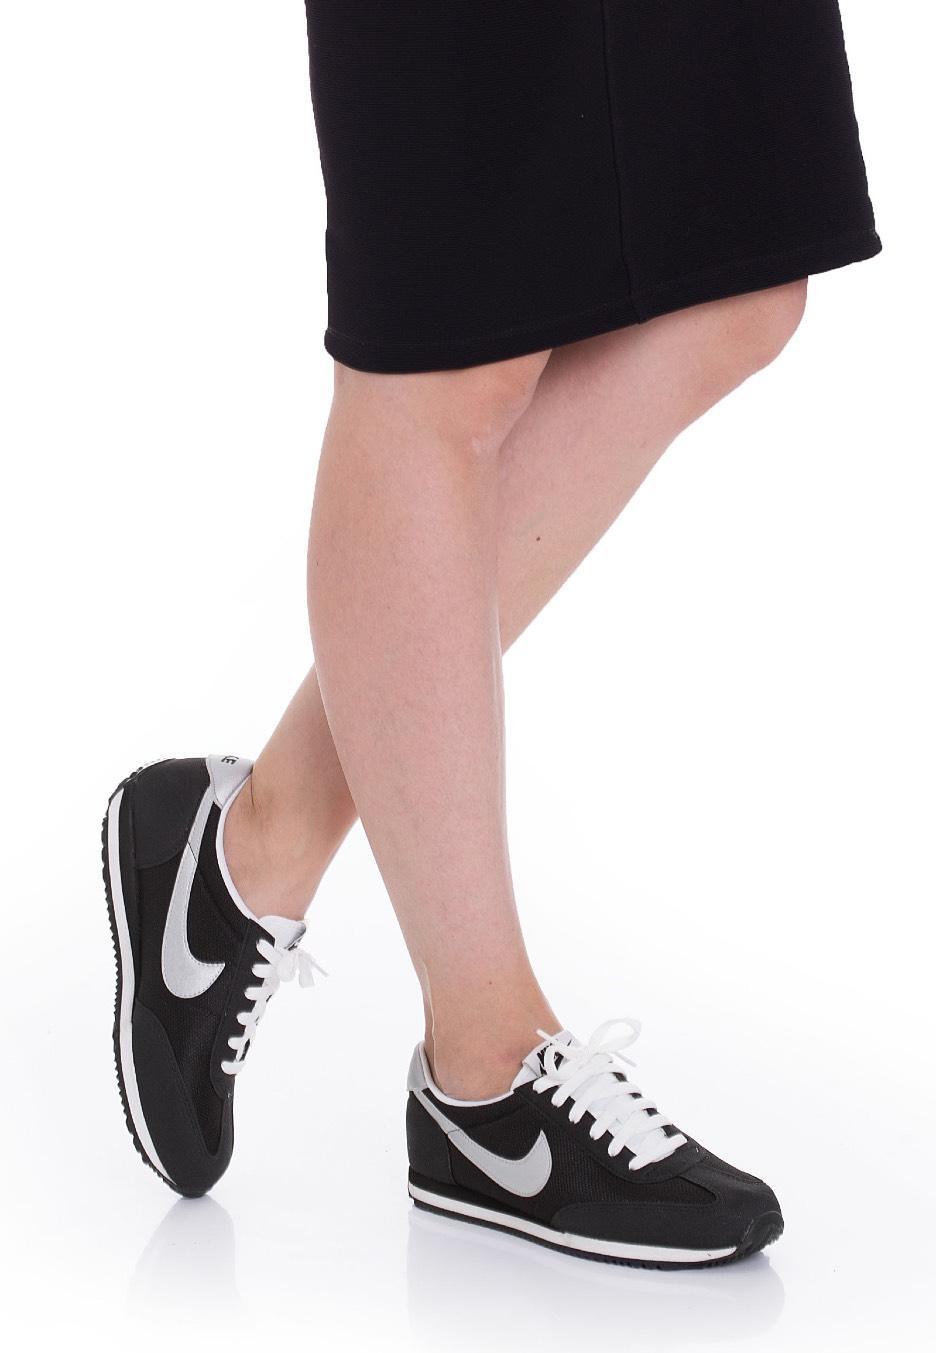 buy popular 1350c 2a95e ... Nike - Oceania BlackMetallic SilverSummit White - Girl Shoes